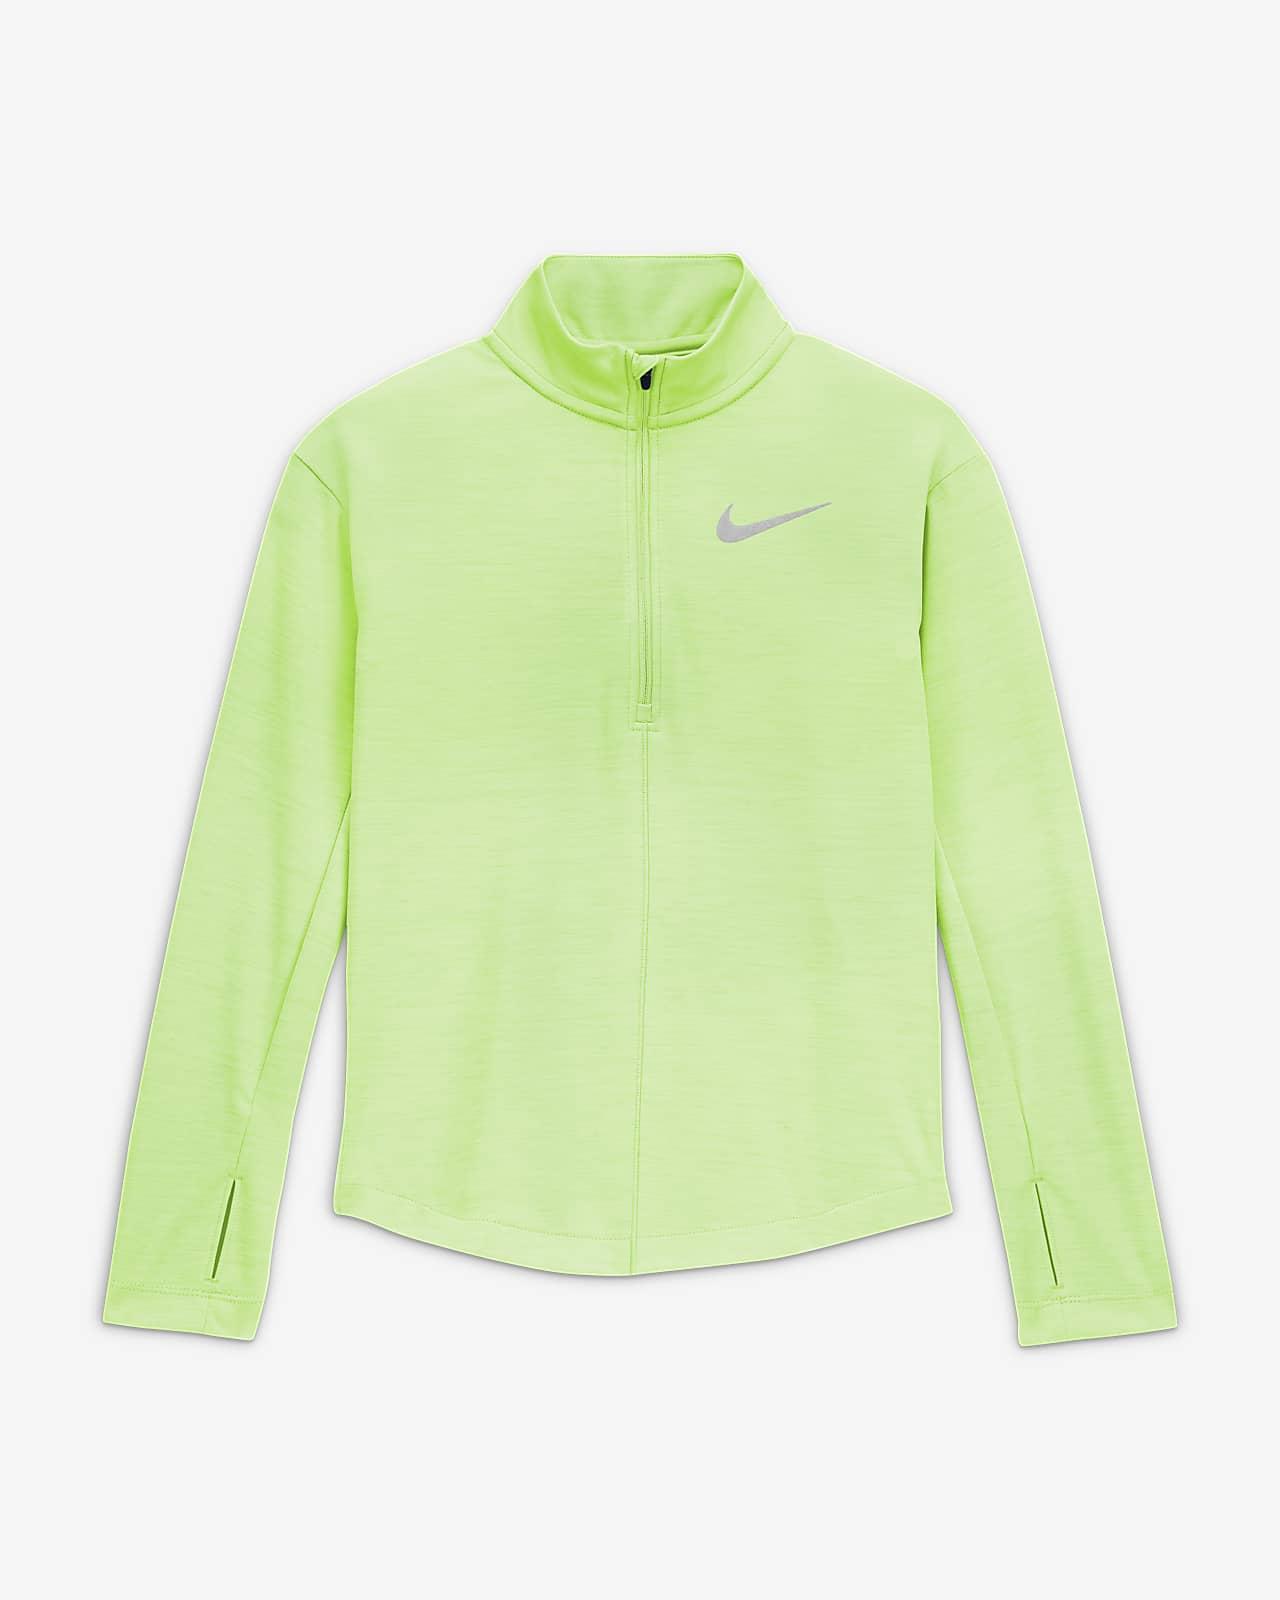 Nike Big Kids' (Girls') 1/2-Zip Long-Sleeve Running Top